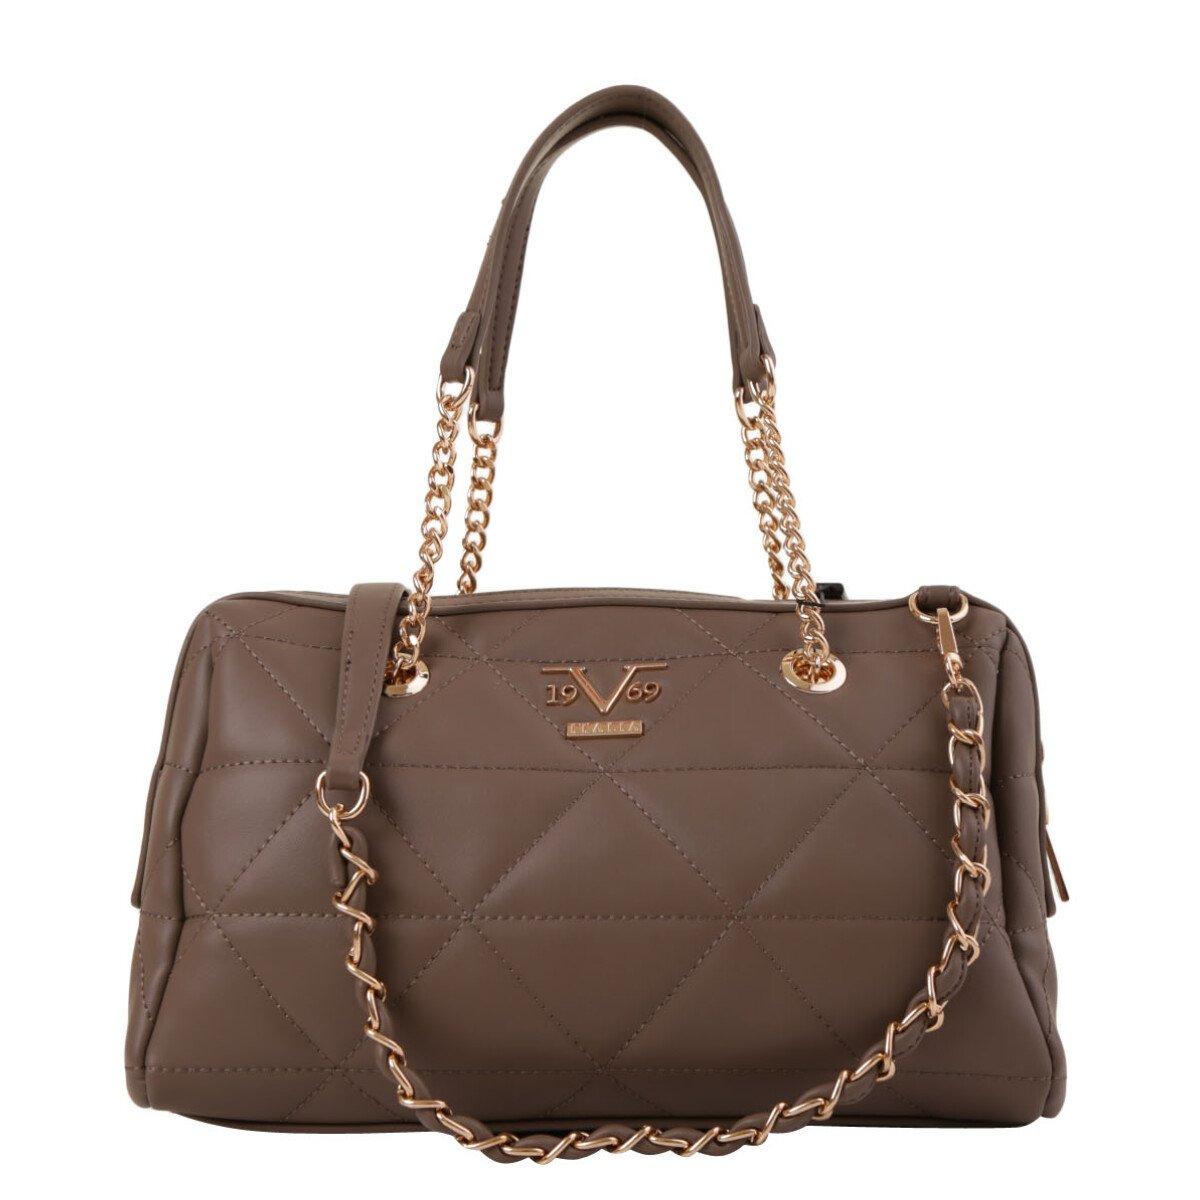 19v69 Italia Women's Handbag Various Colours 319004 - brown UNICA